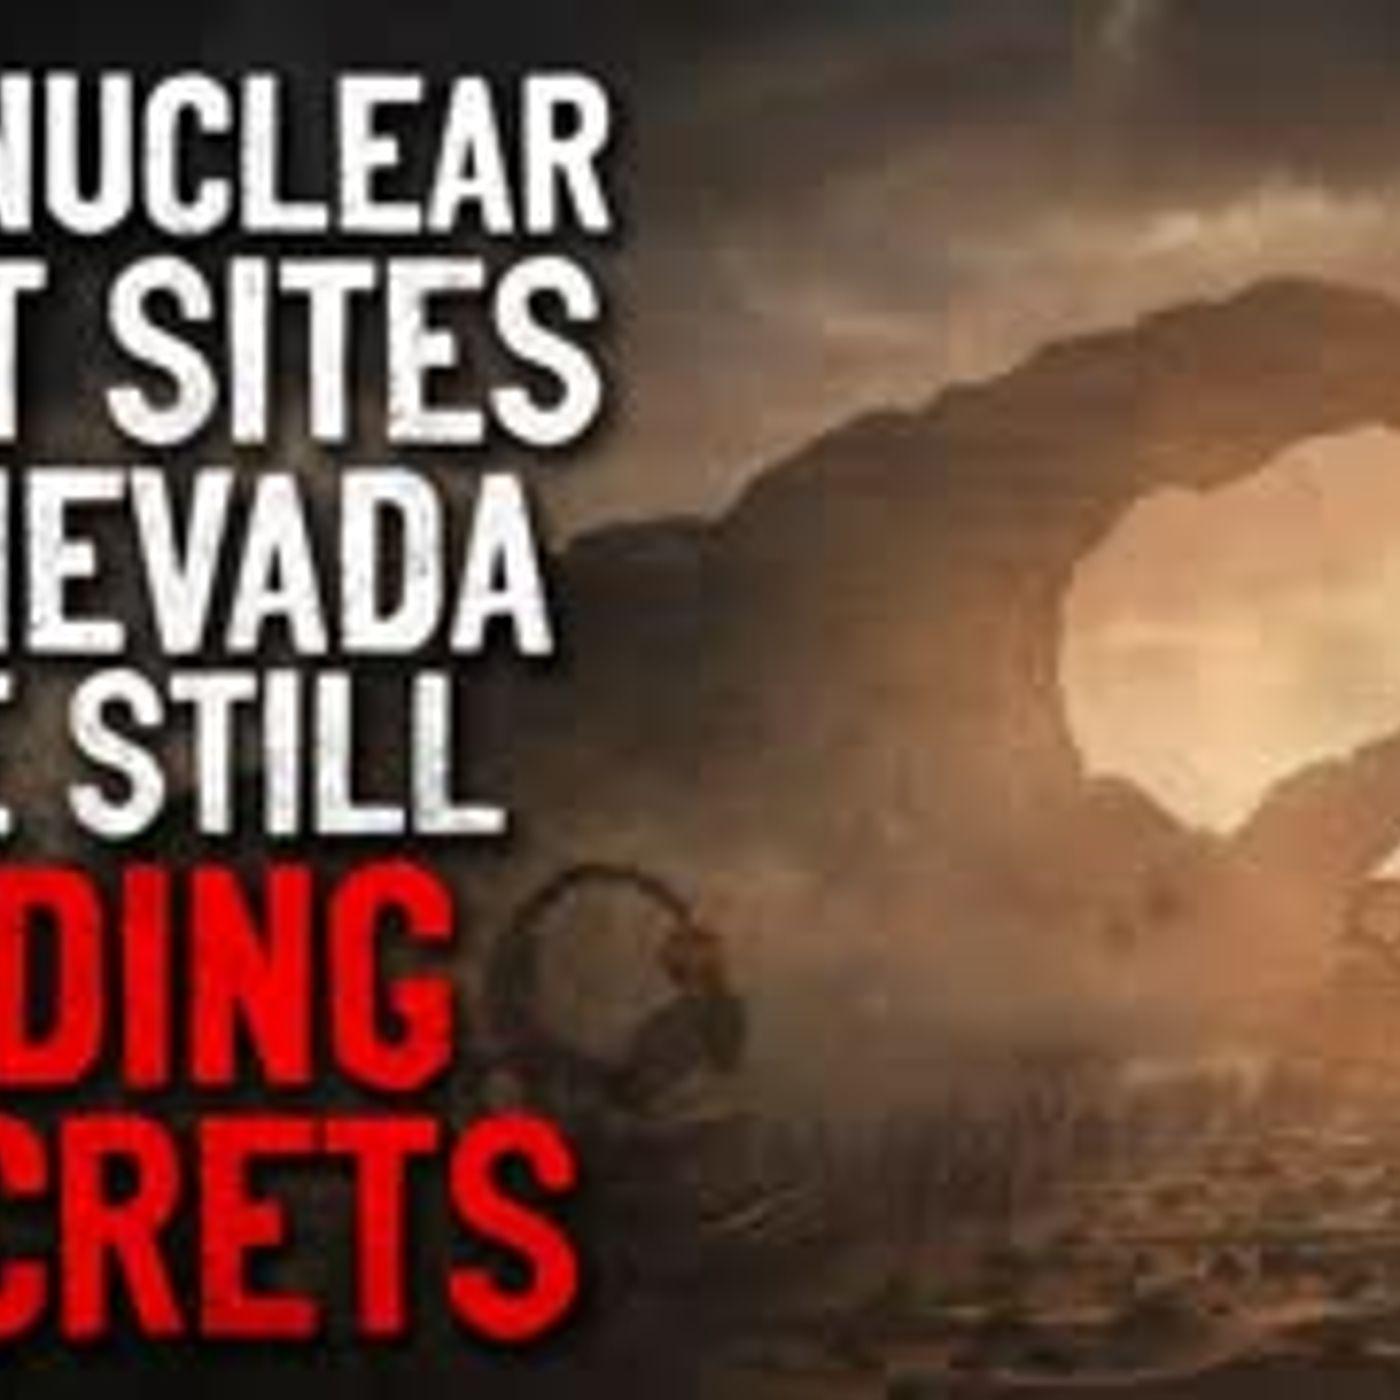 """The nuclear test sites in Nevada are still hiding secrets"" Creepypasta"